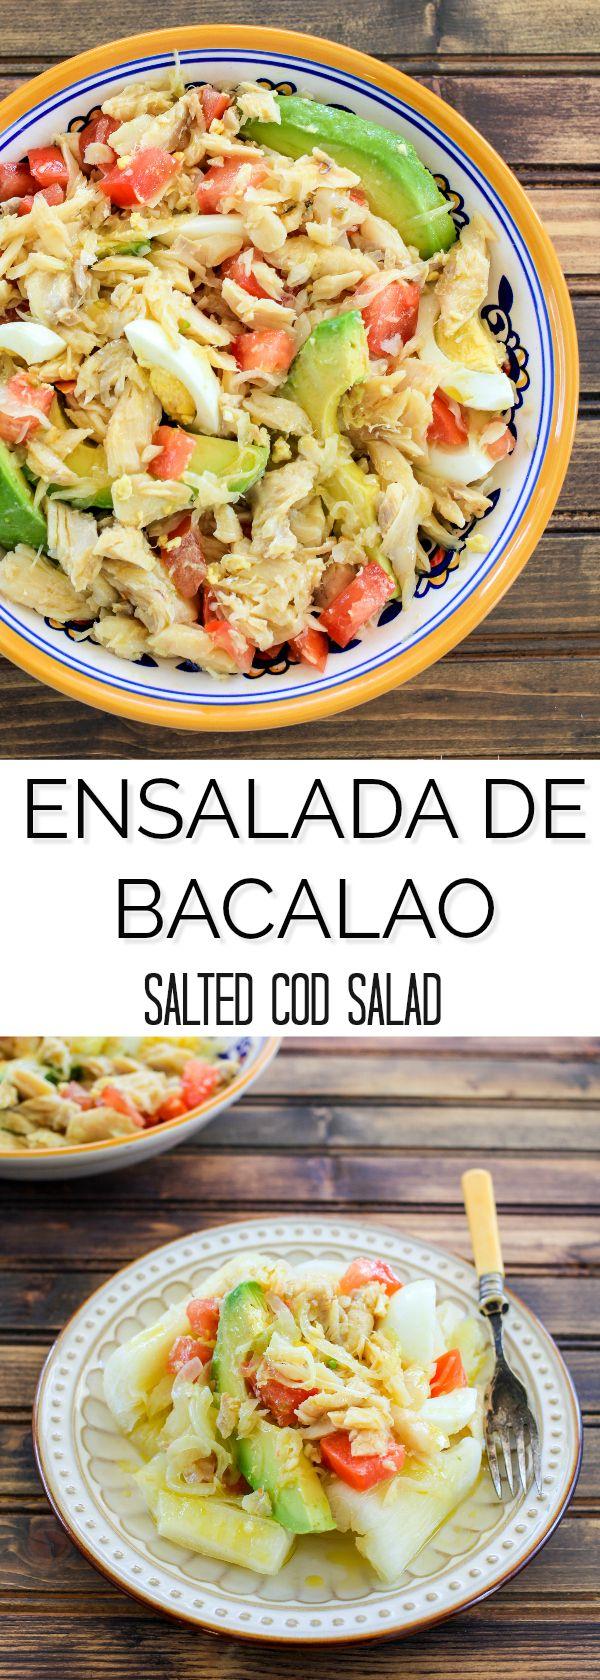 Ensalada de Bacalao (Salted Cod Salad)   TheNoshery